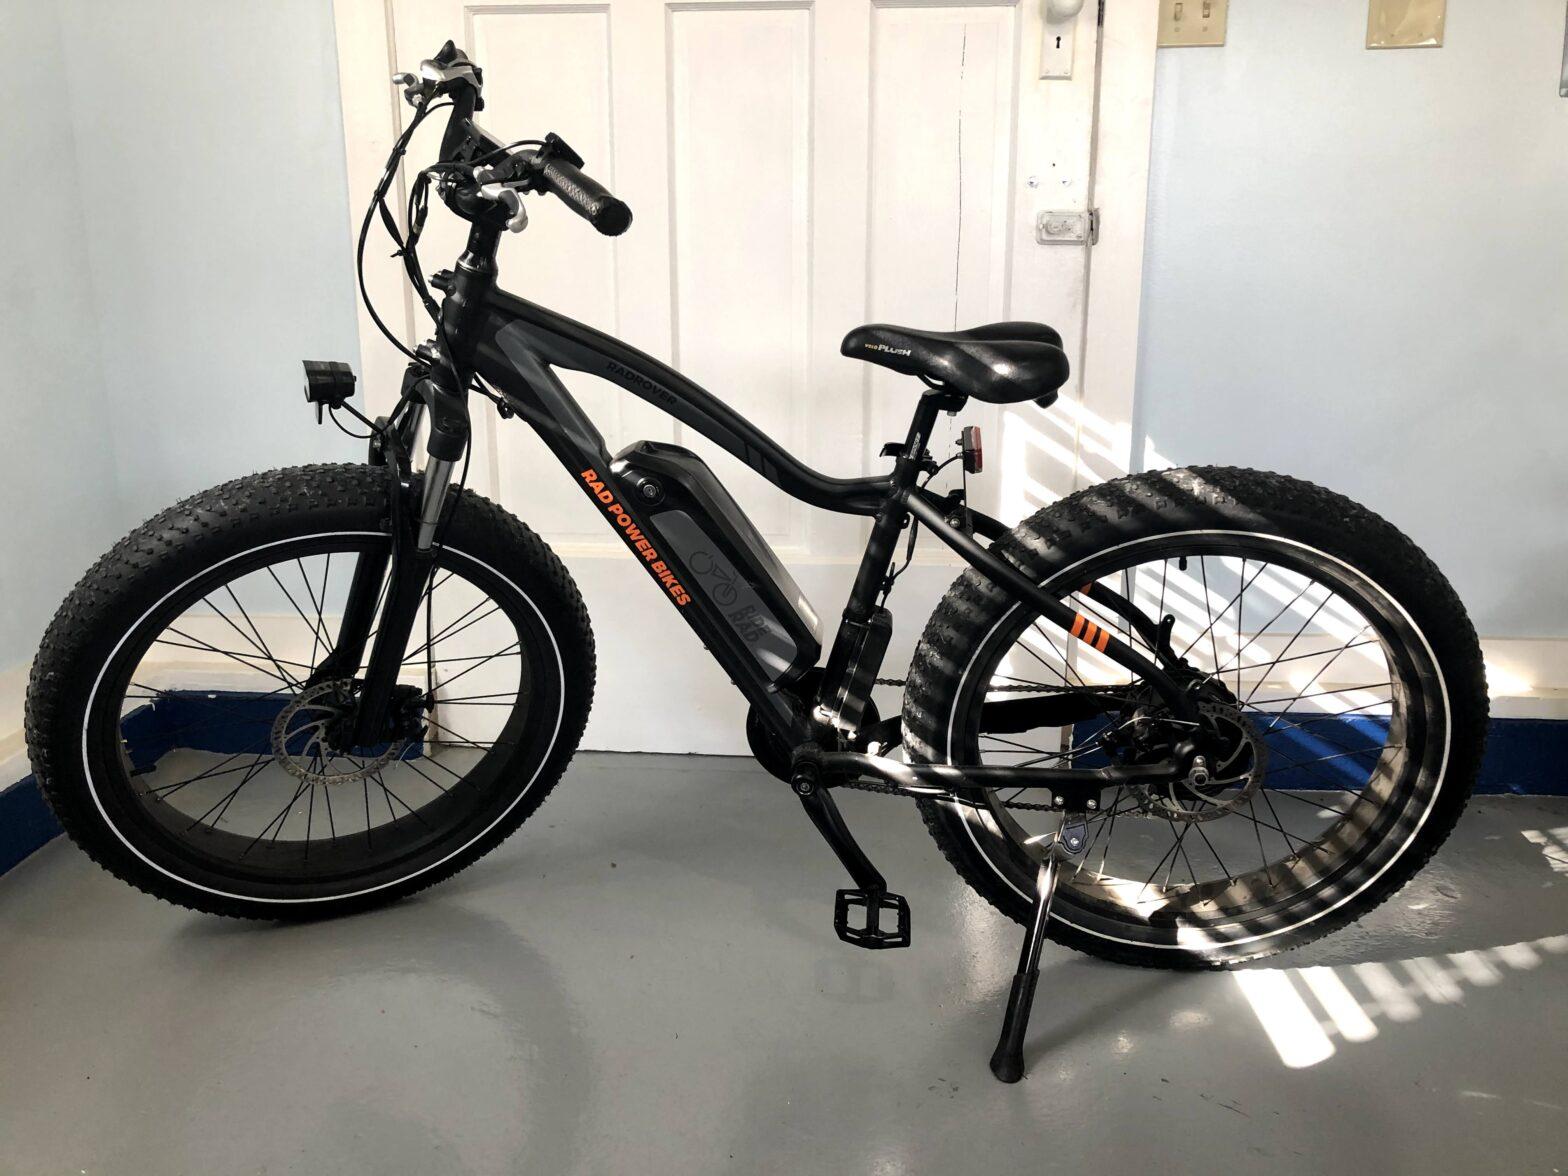 2019 RadRover by Rad Power Bikes – 349 miles – $1,300